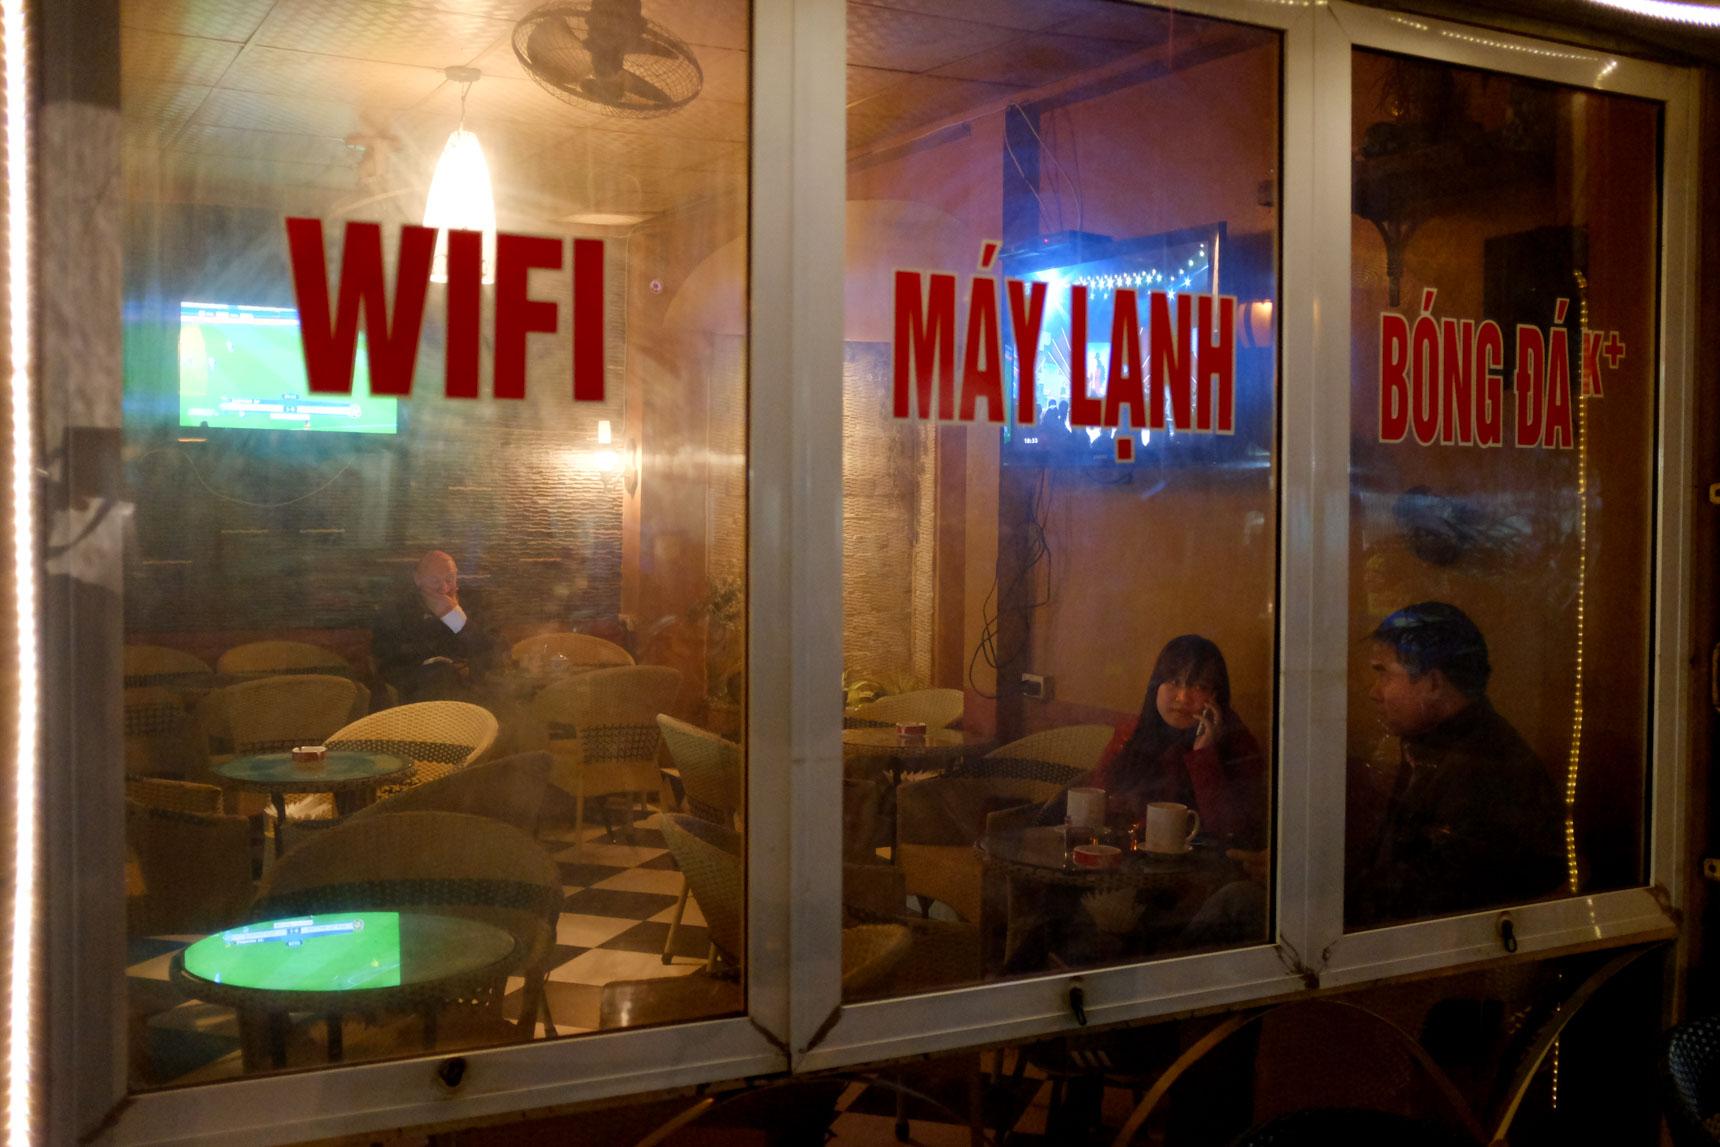 Cafe, Nghĩa Tân, Cầu Giấy District